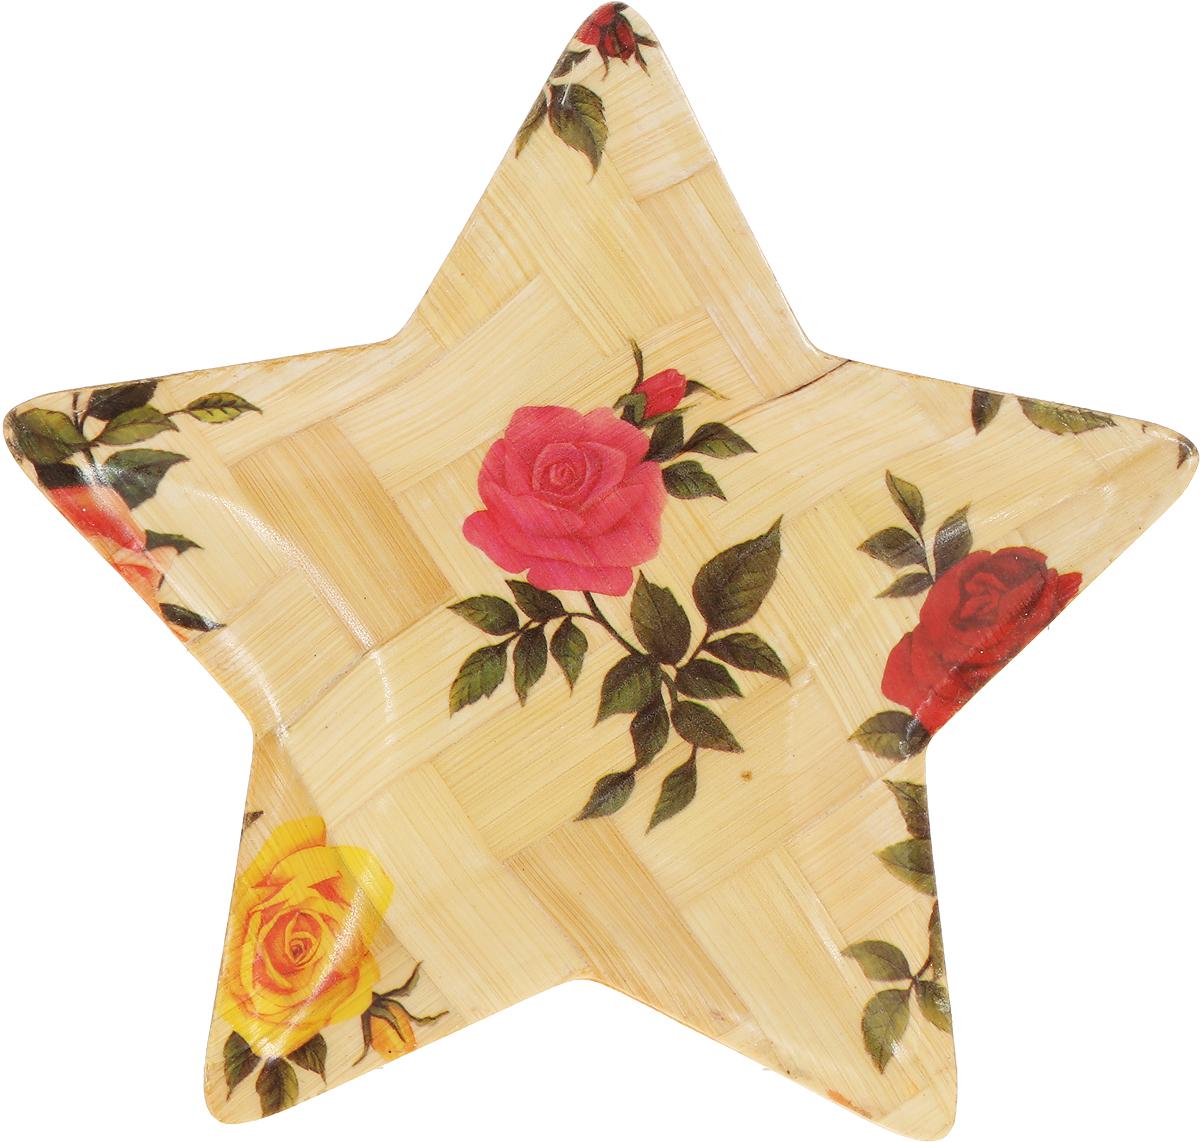 "Тарелка Wanxie ""Звезда.Розы"", 13,5 x 13,5 x 1 см"